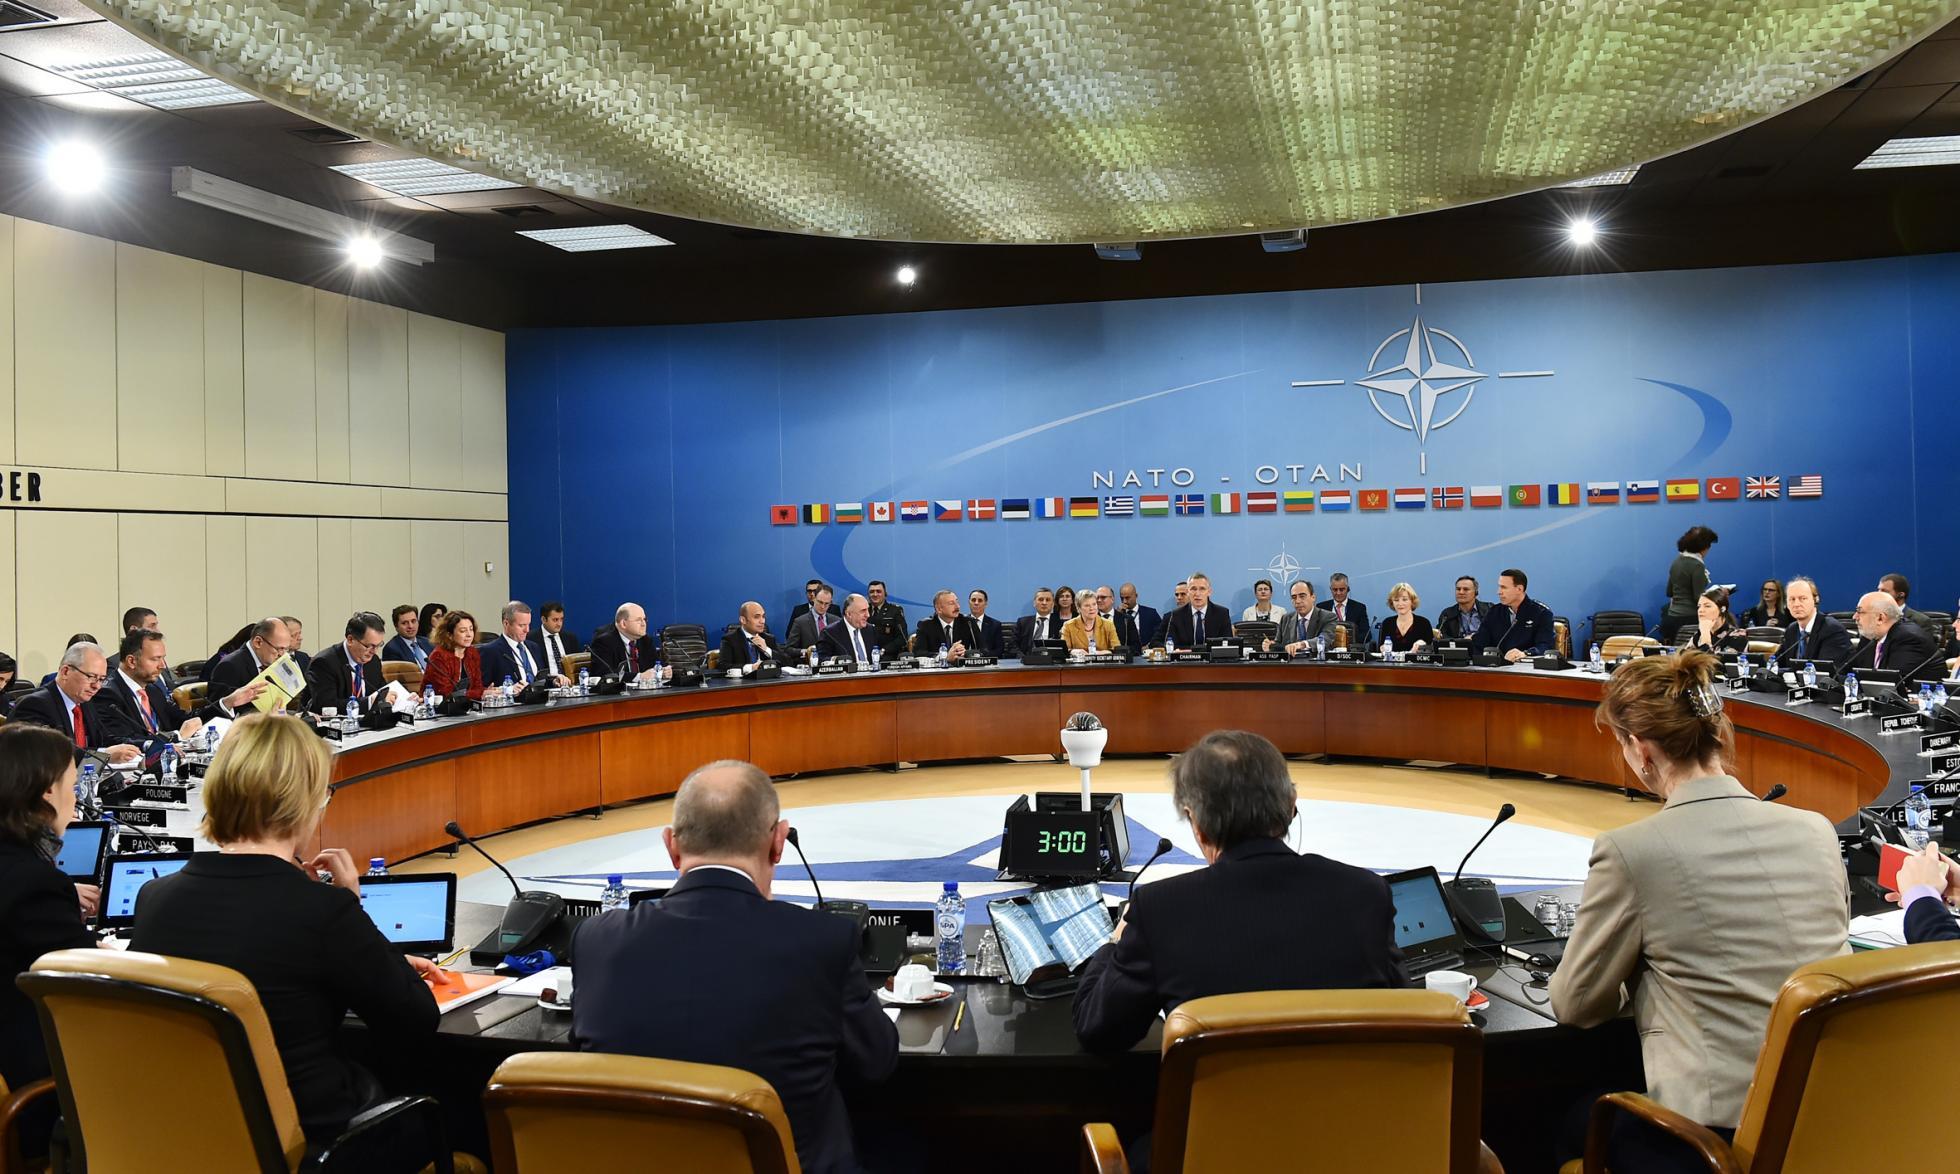 north atlantic council meeting - 1000×599